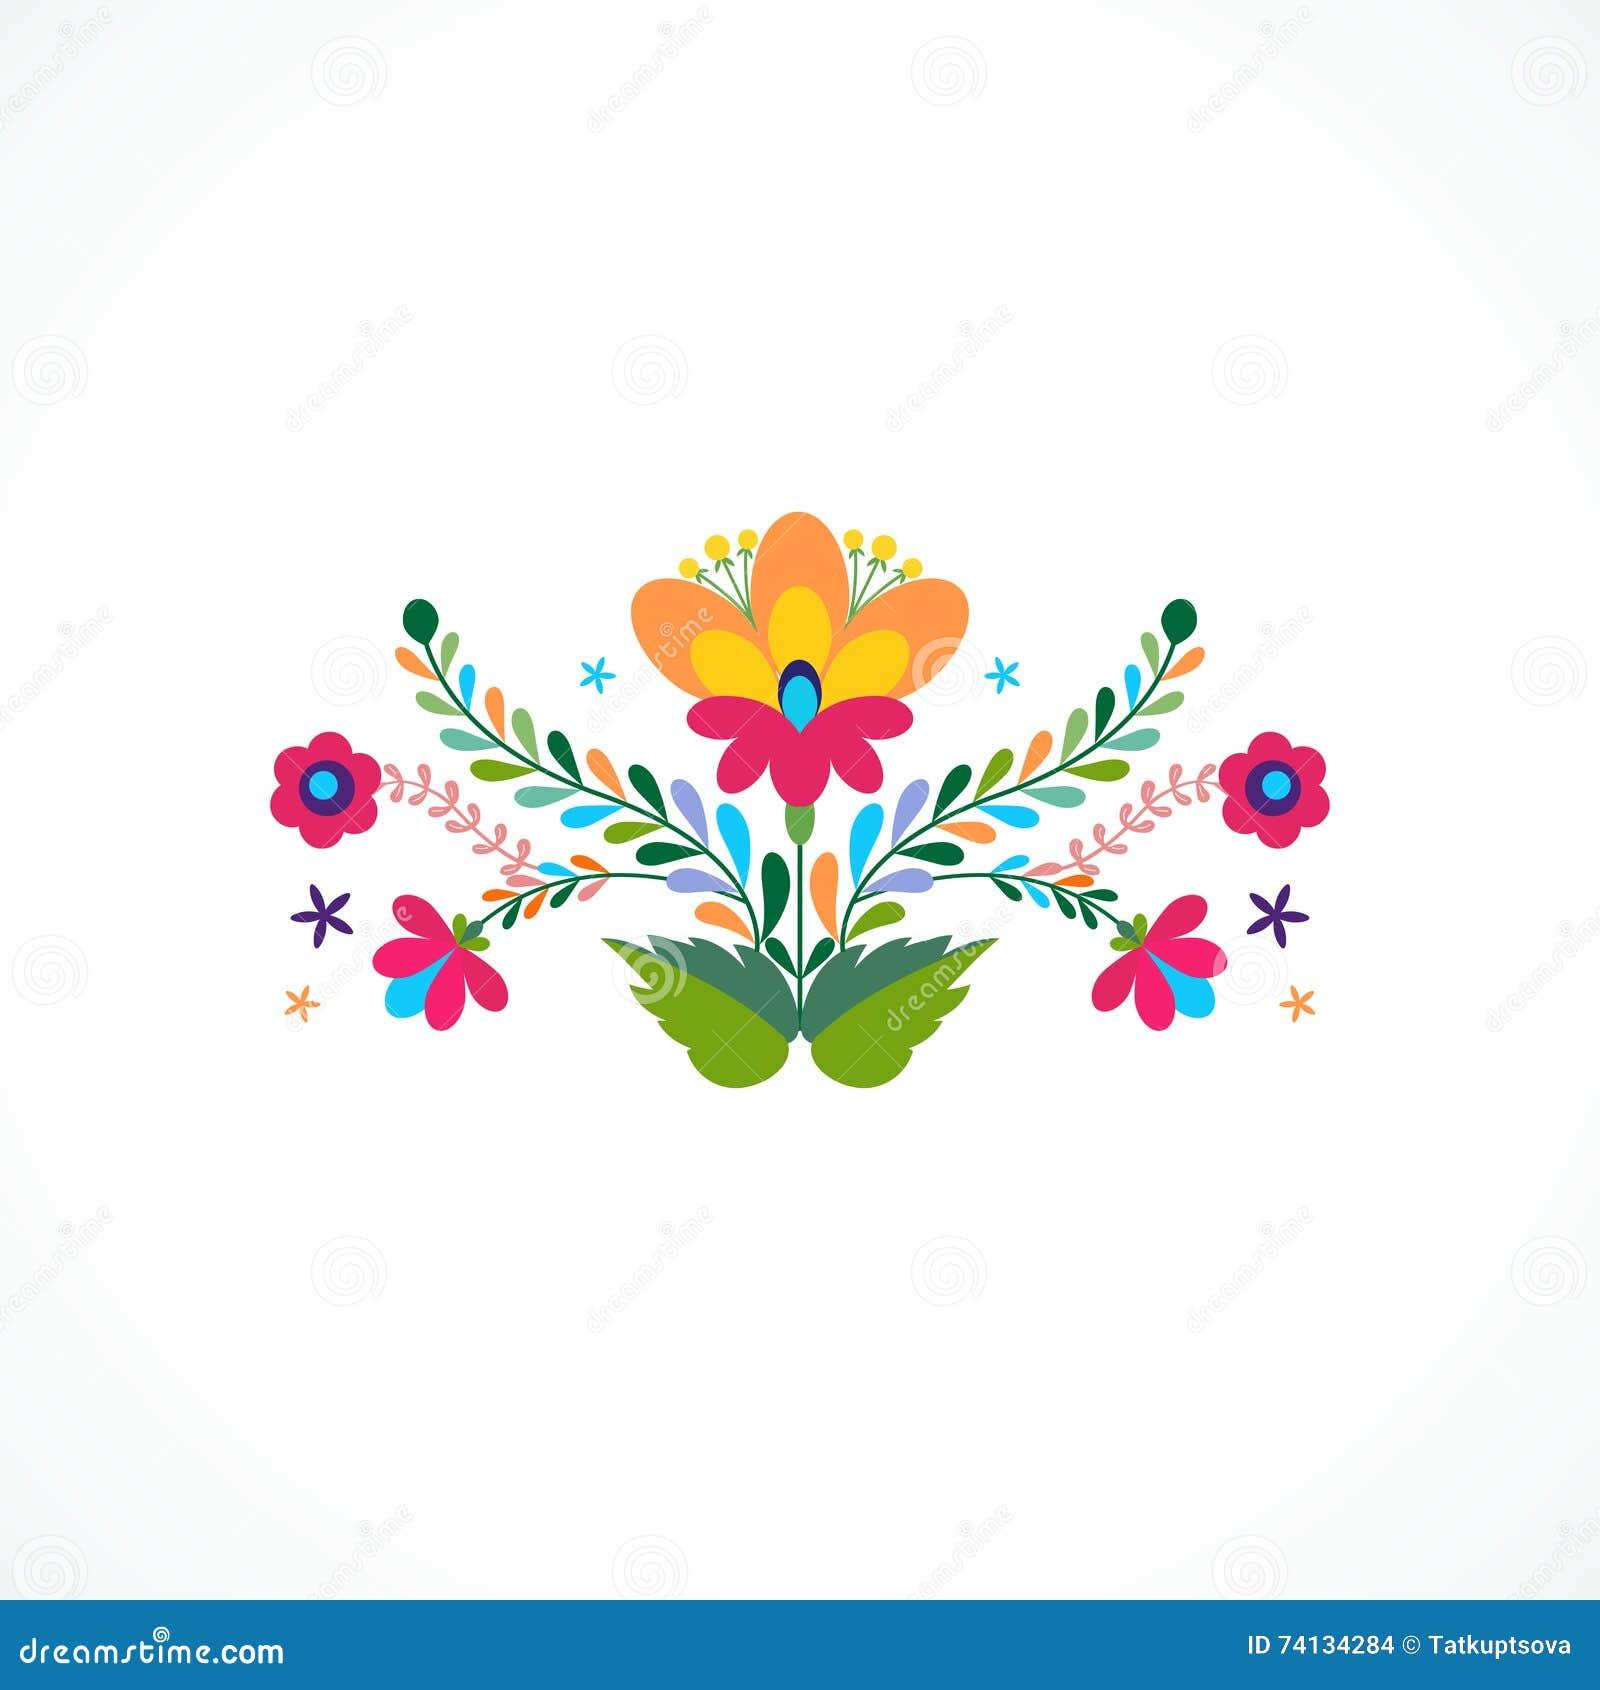 mariachi cartoons illustrations amp vector stock images